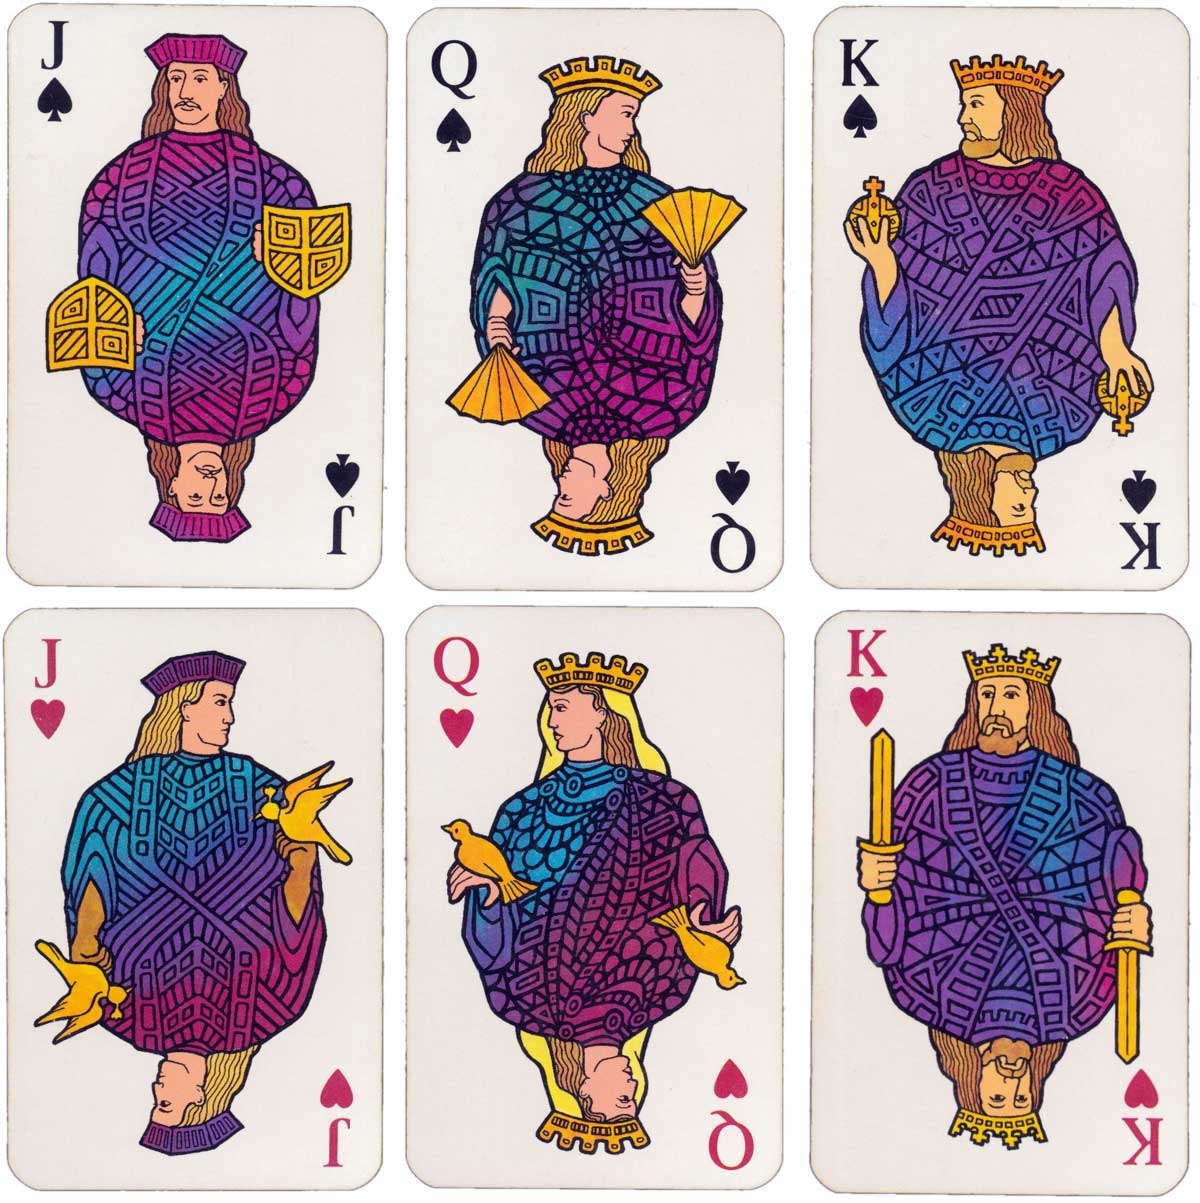 British Airways Concorde playing cards made in Belgium by Carta Mundi, before 2003